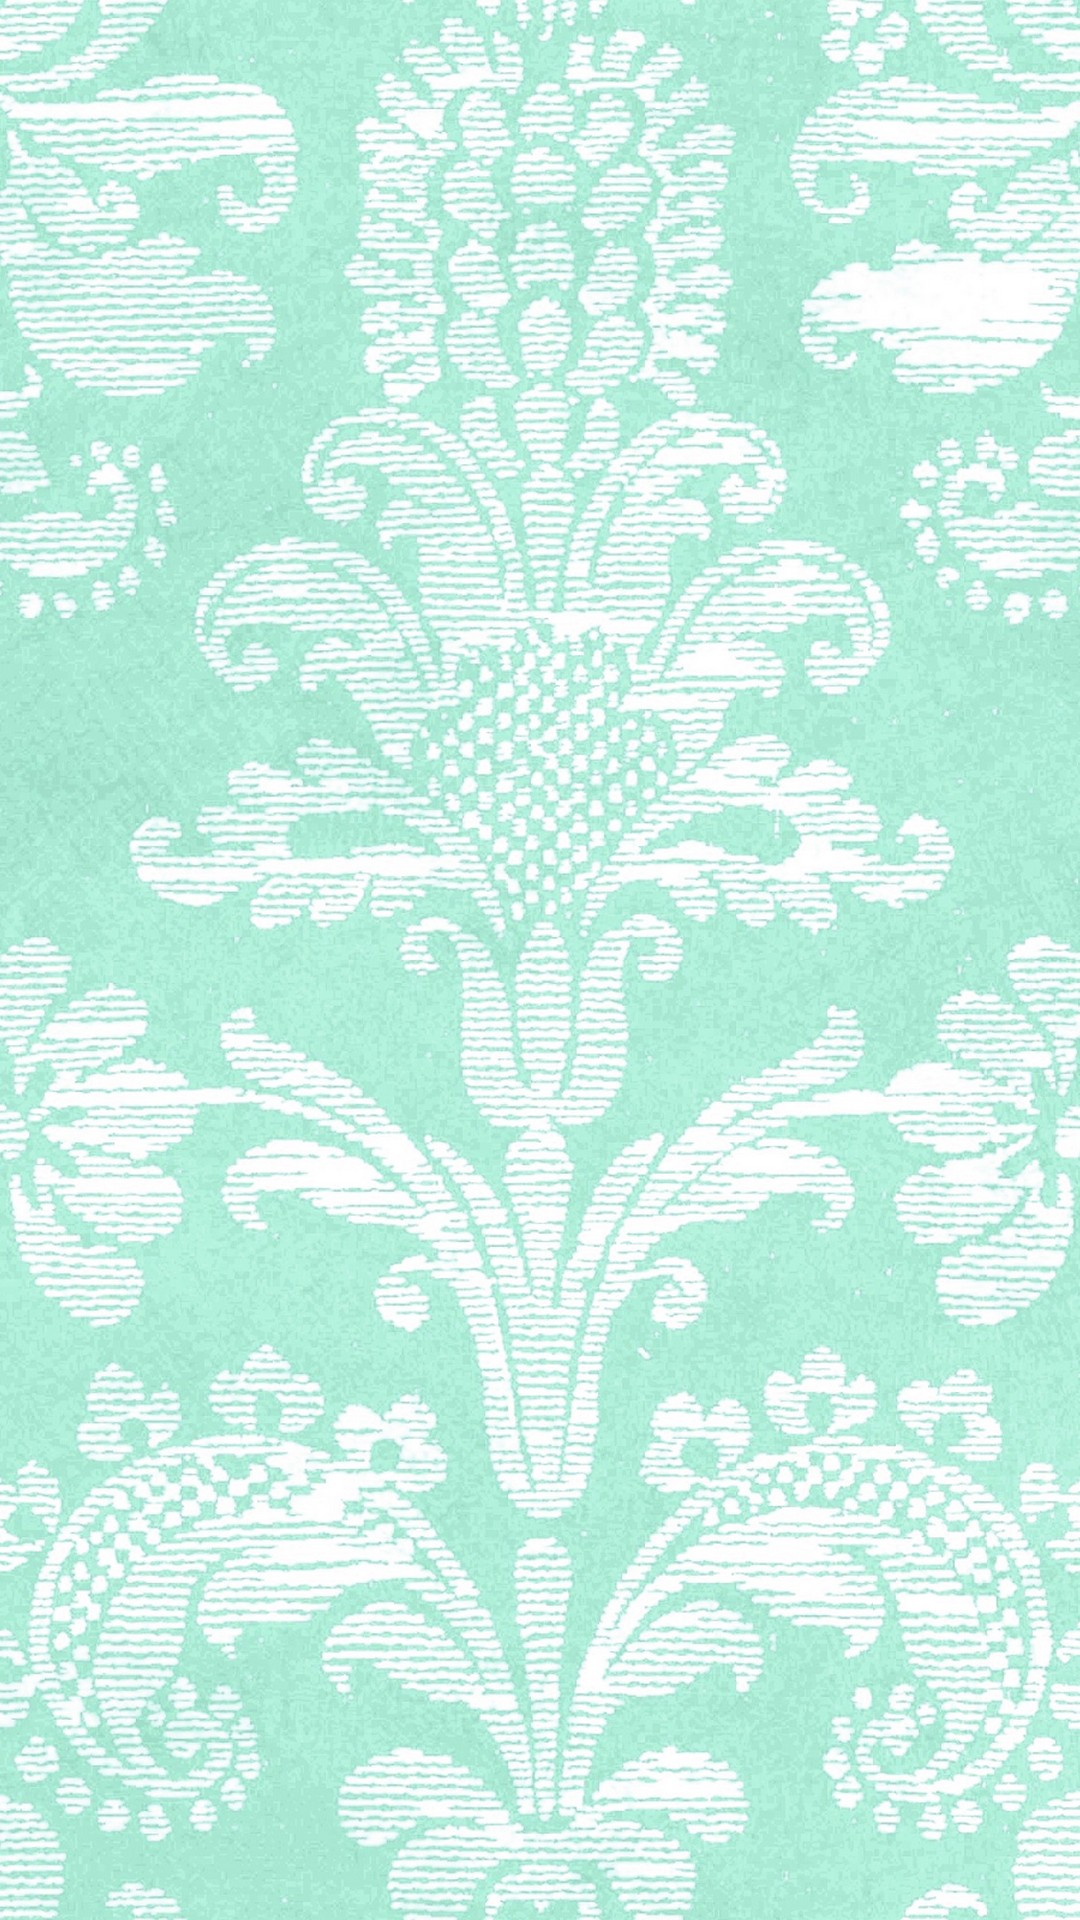 Mint Green Iphone X Wallpaper 2020 Cute Wallpapers